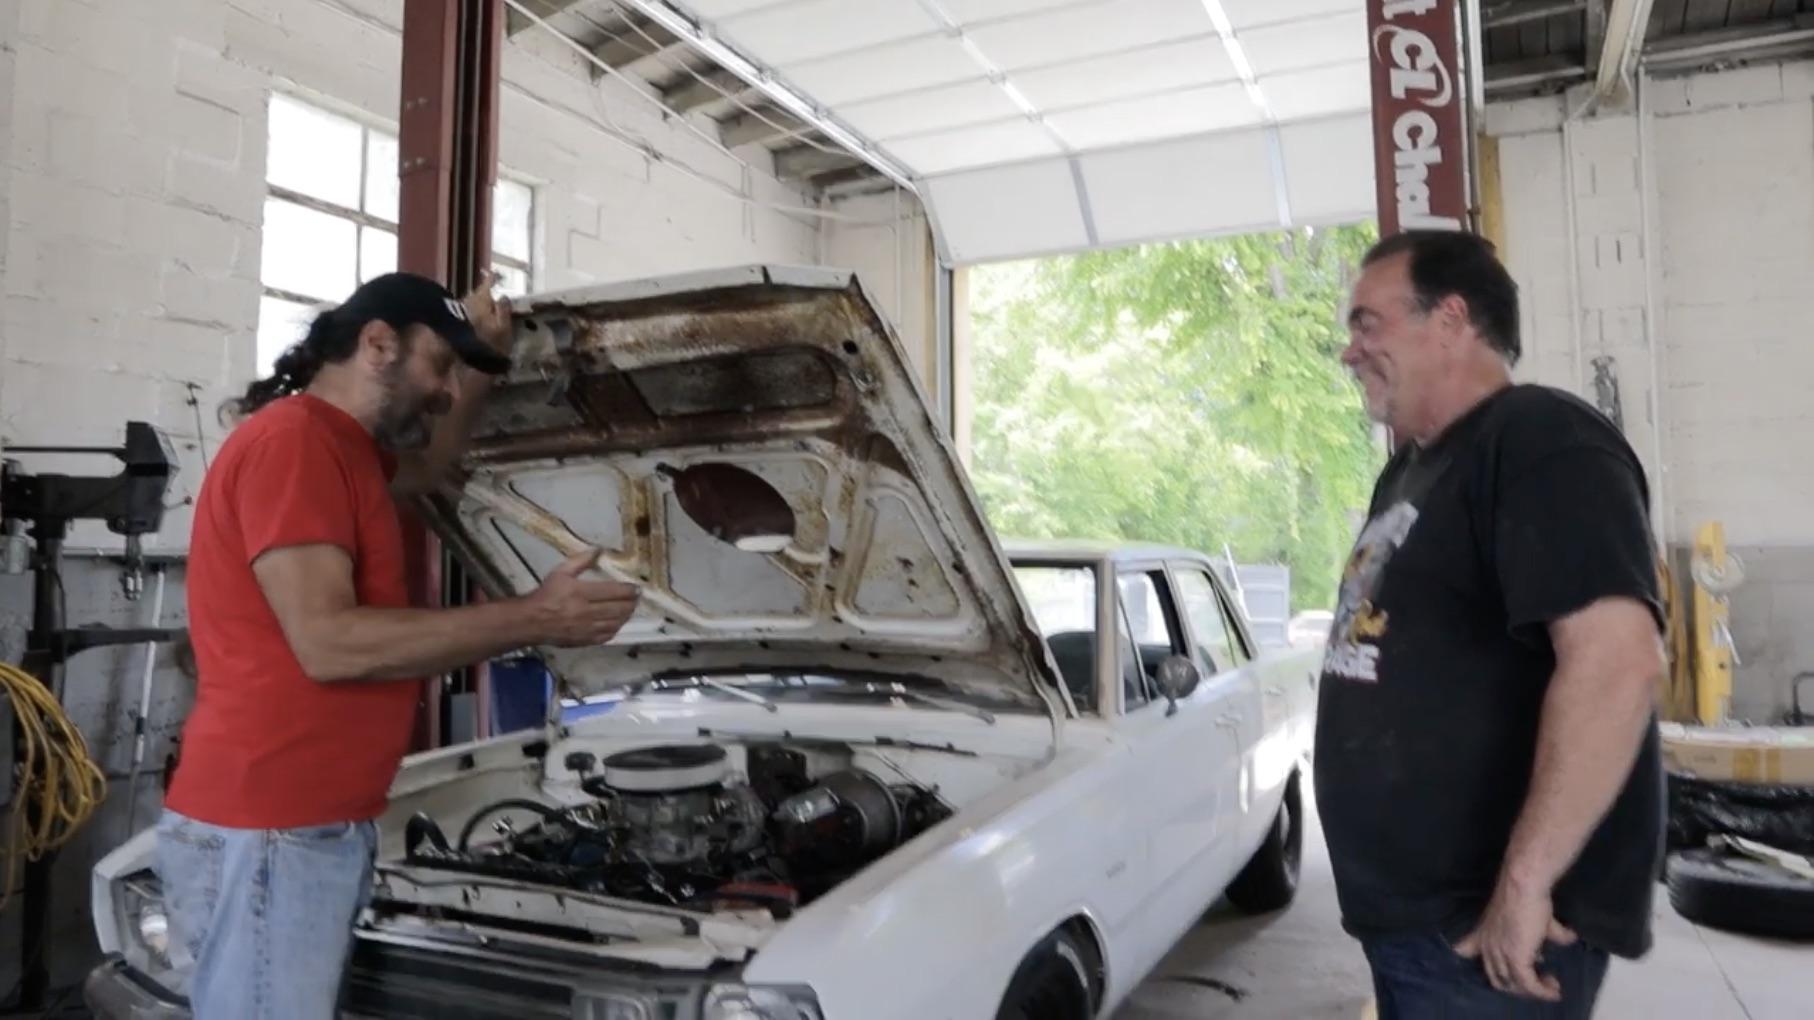 Now That's Unique: Uncle Tony Checks Out A 1972 Dodge Dart With A Turbocharged Slant Six!